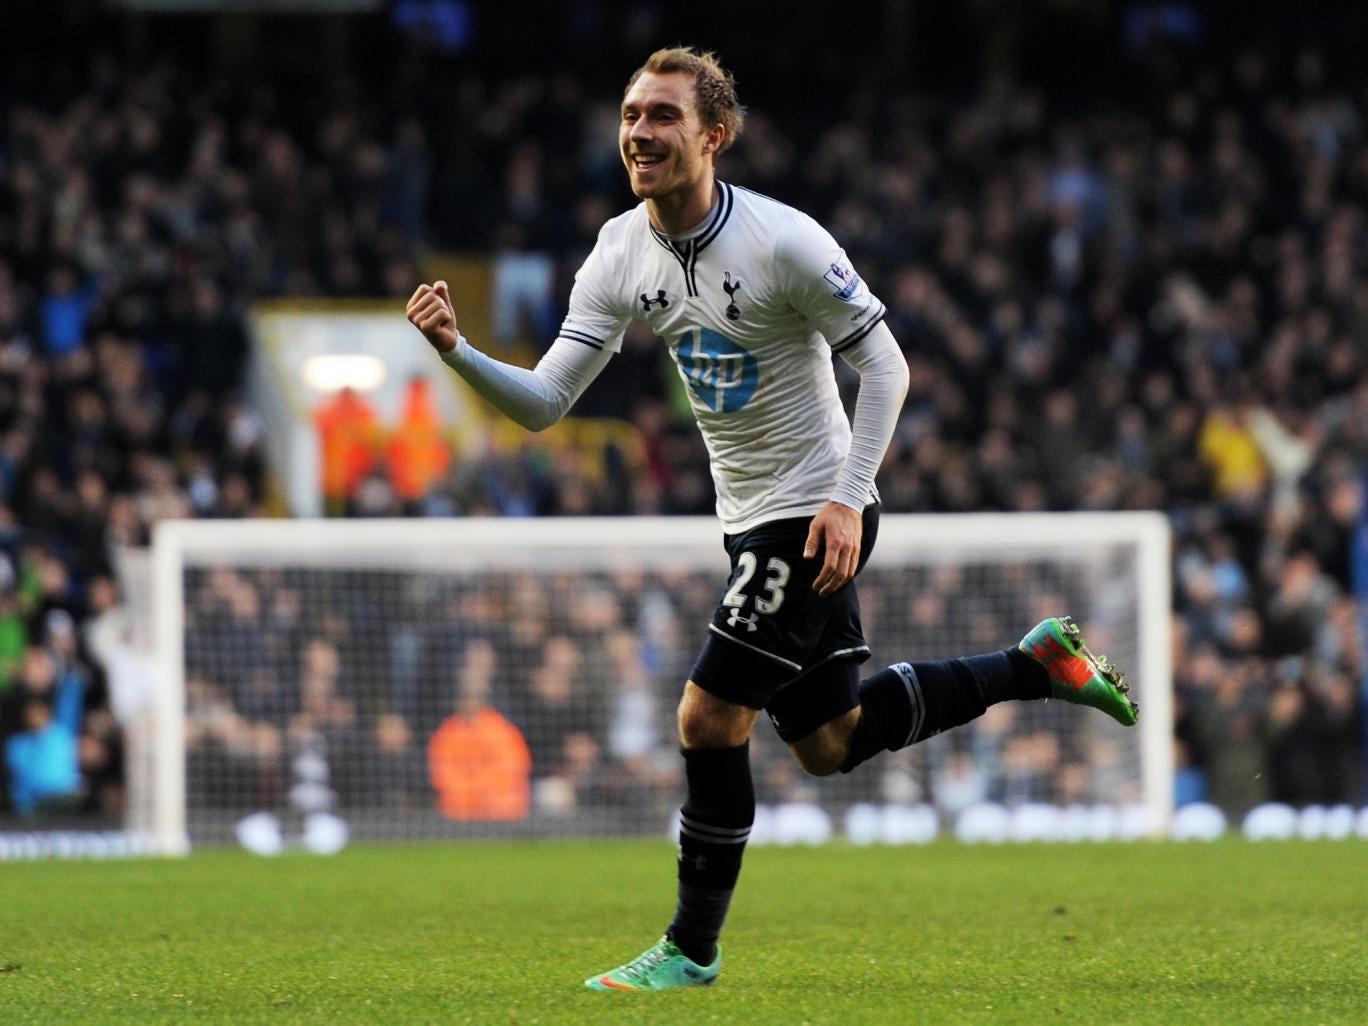 Christian Eriksen celebrates after scoring for Tottenham against West Brom